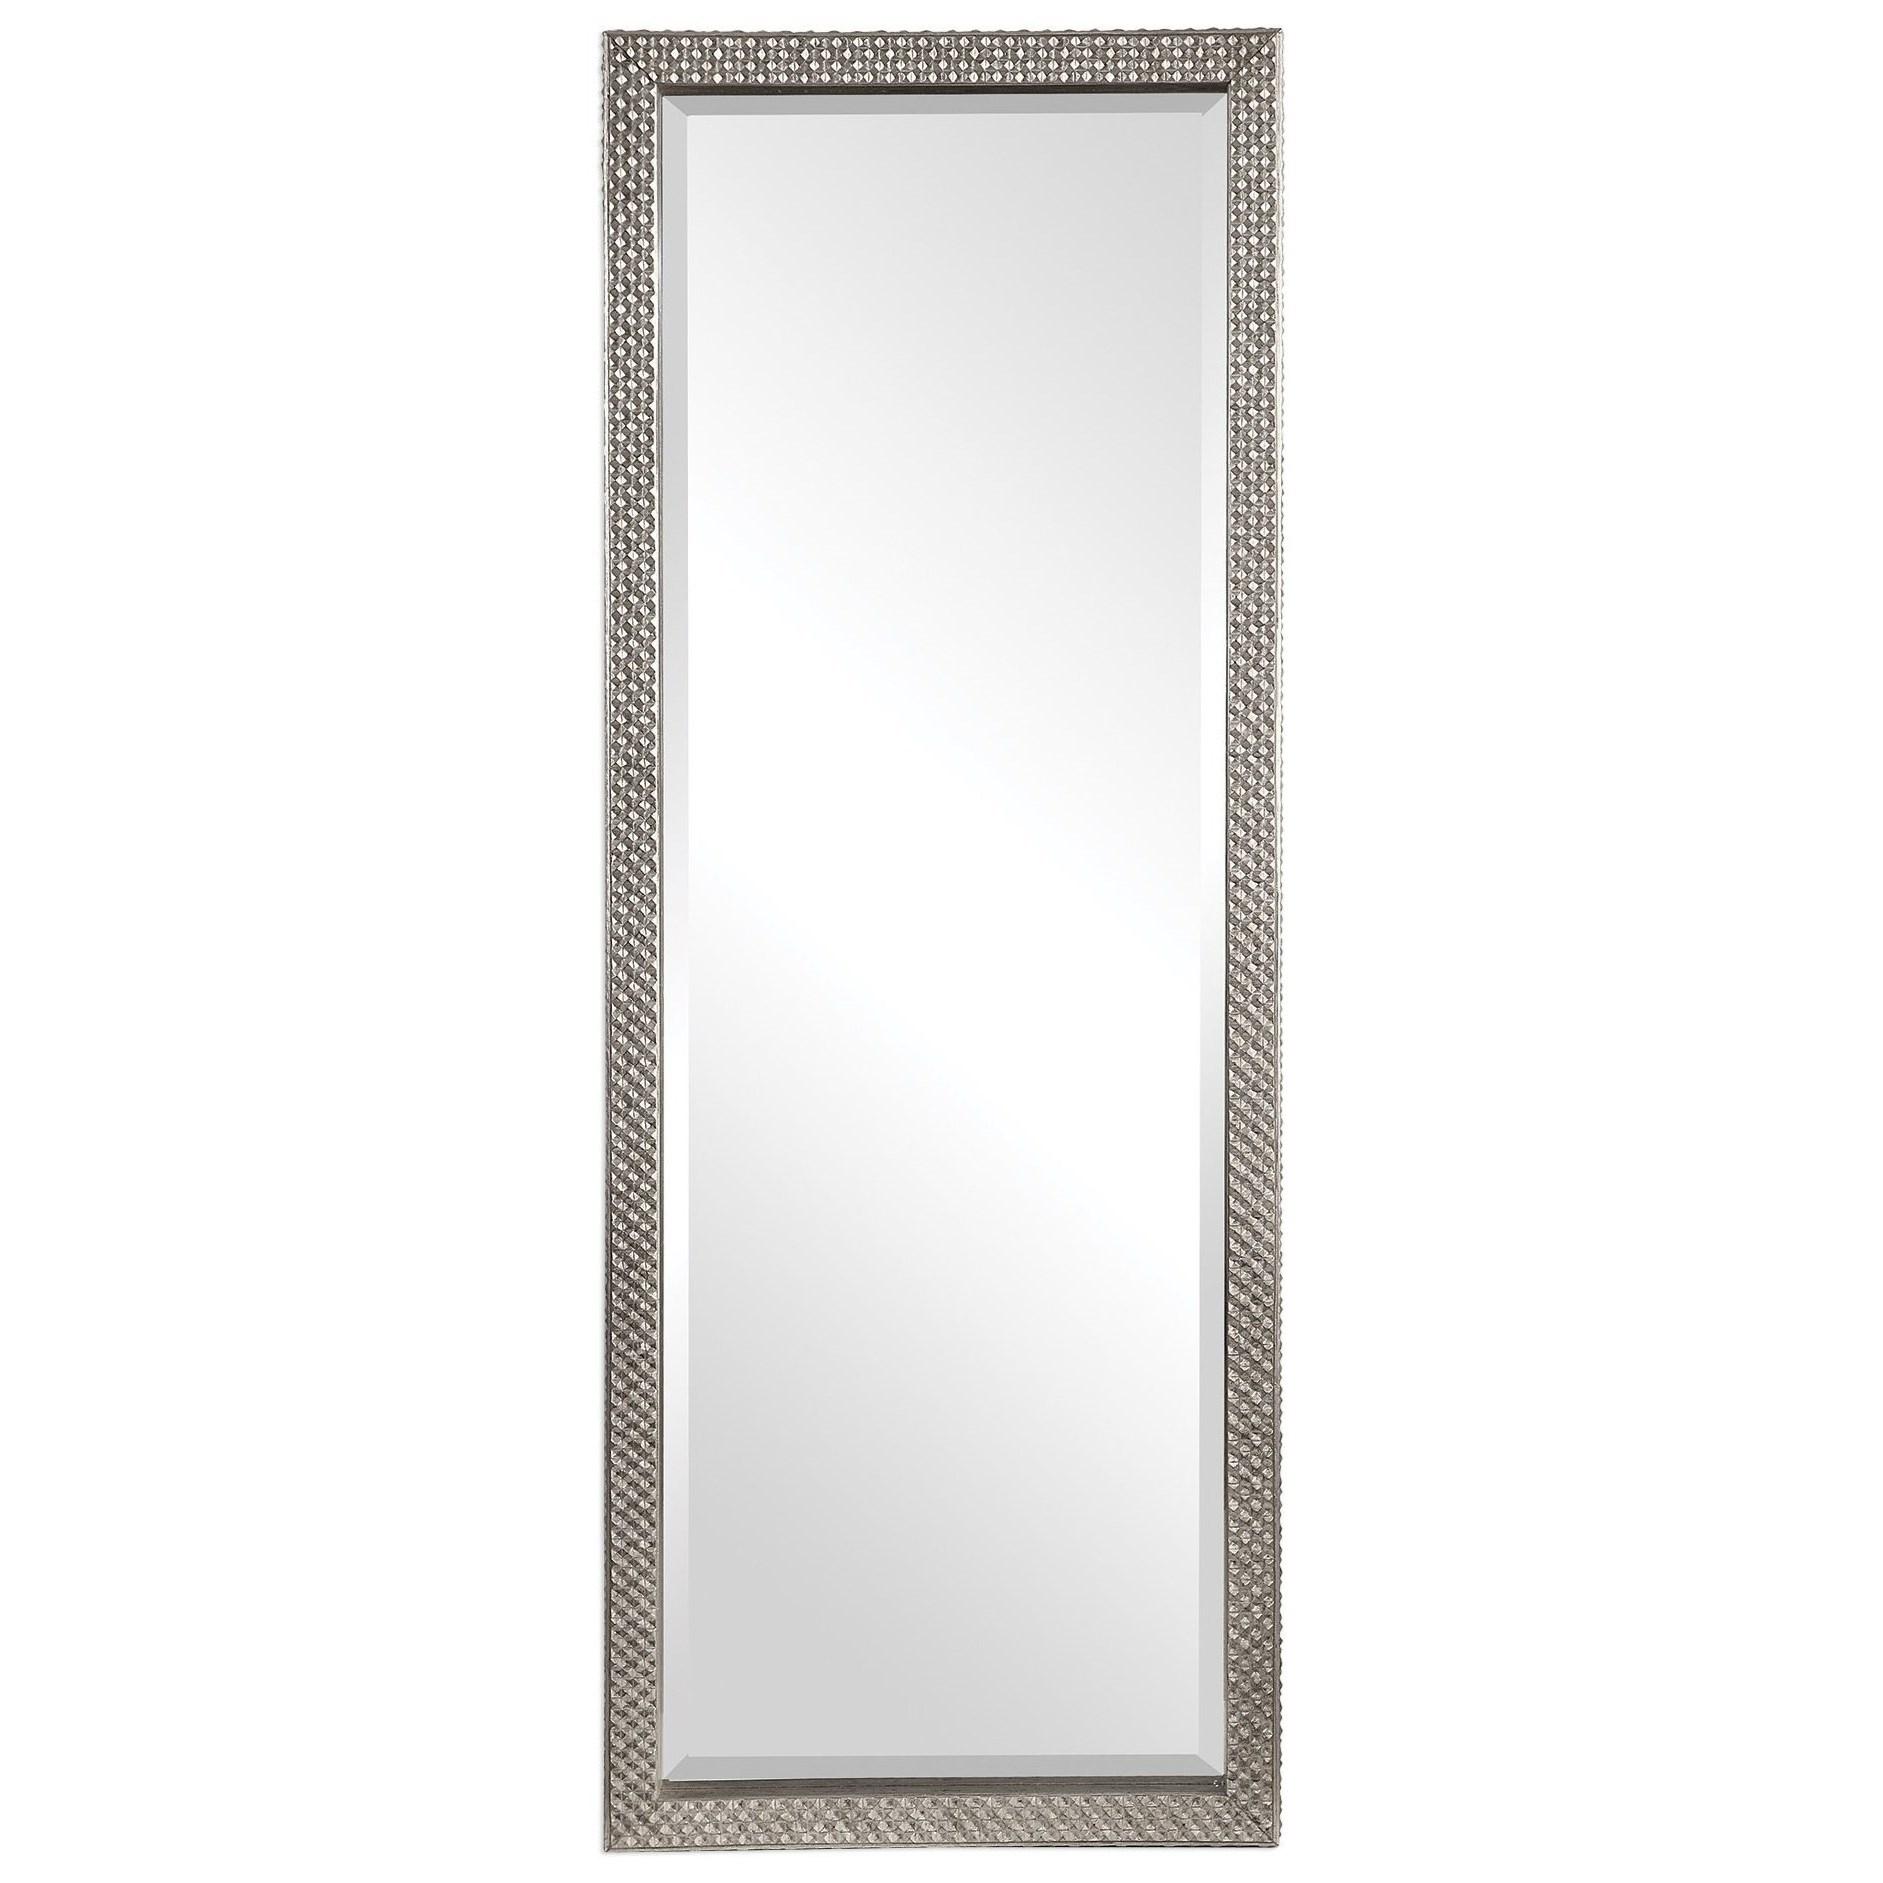 Cacelia Metallic Silver Mirror